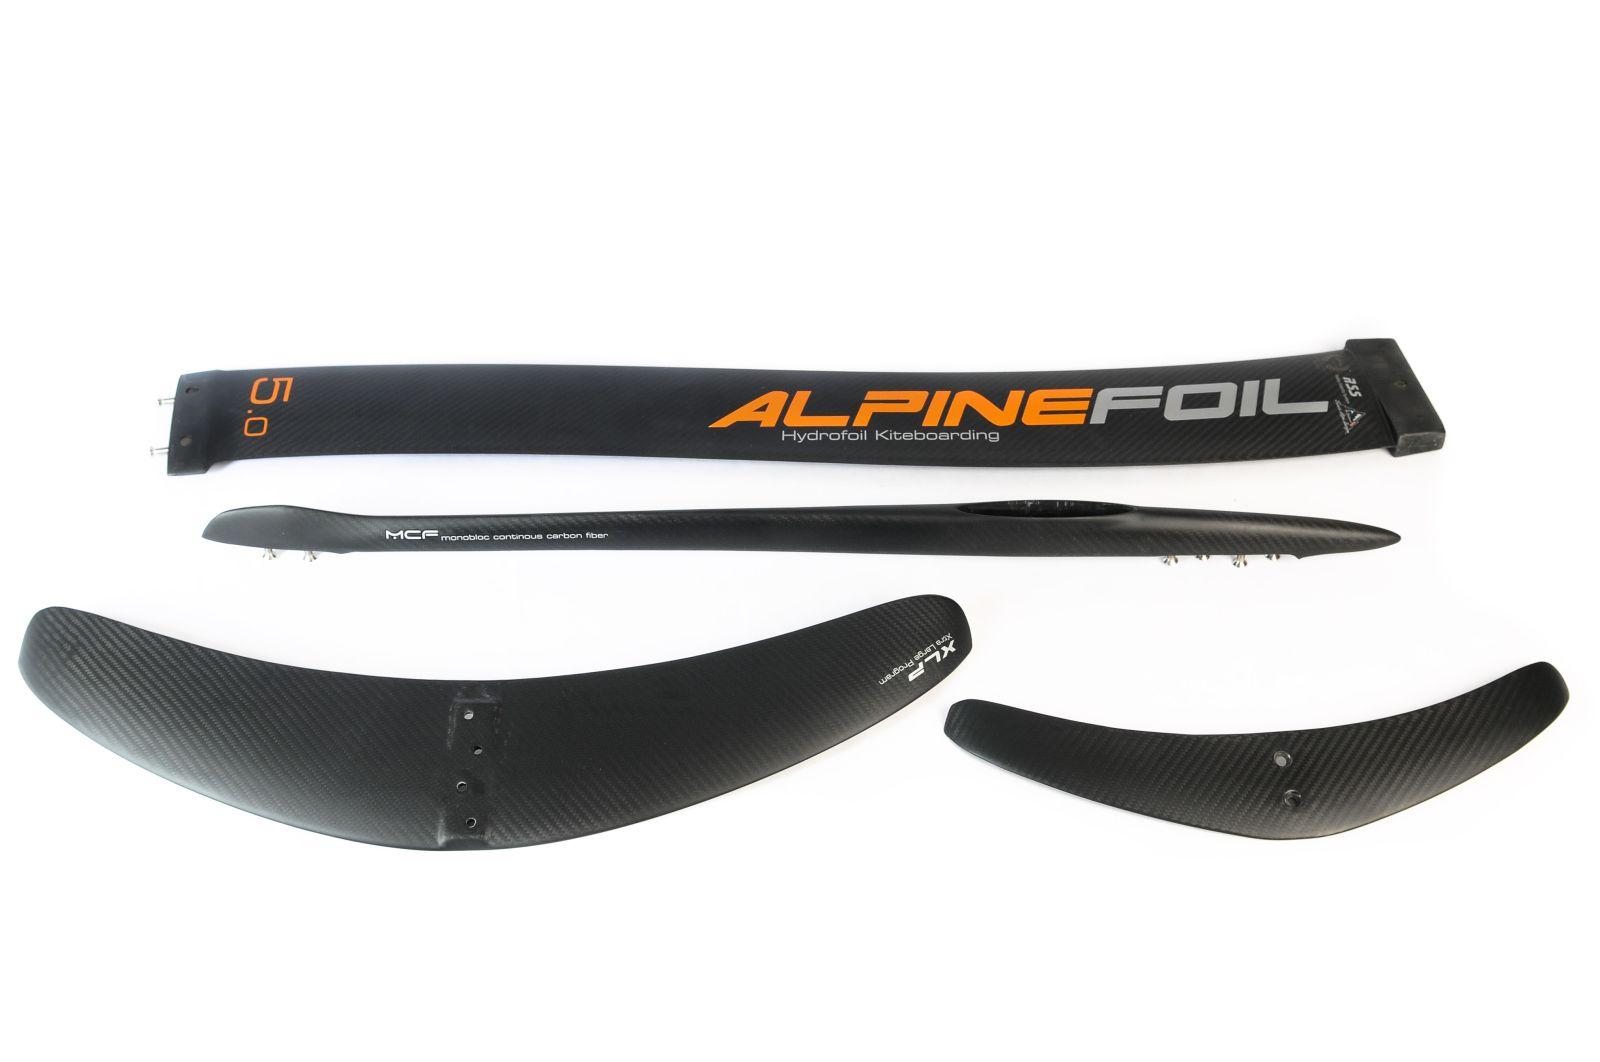 Kitefoil carbon 5 0 alpinefoil hydrofoil foilboard 18612026 1